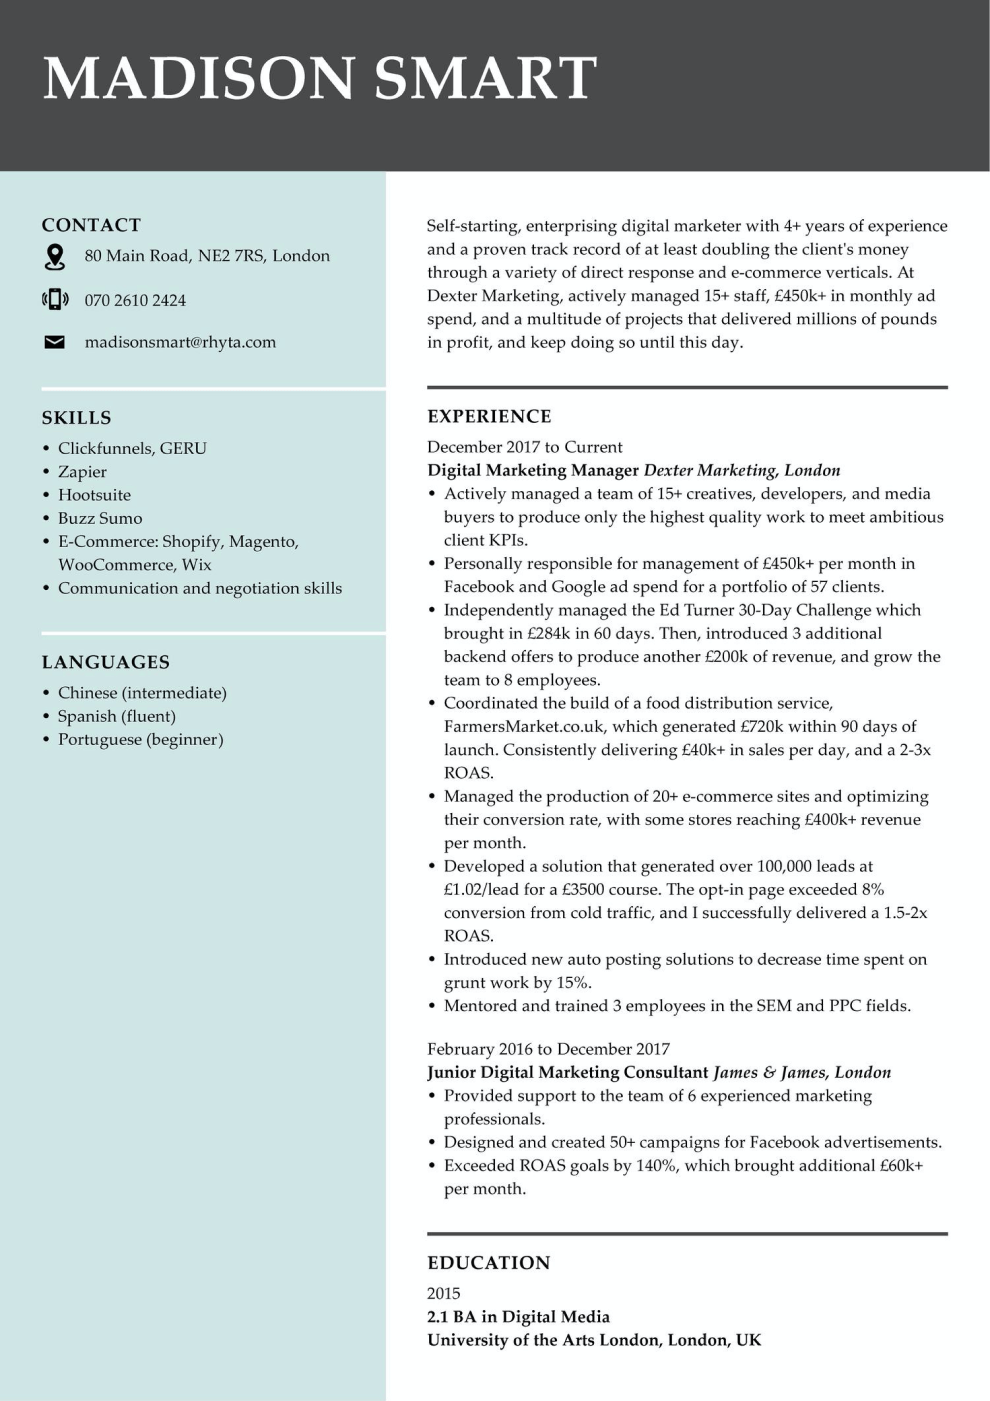 Marketing CV example